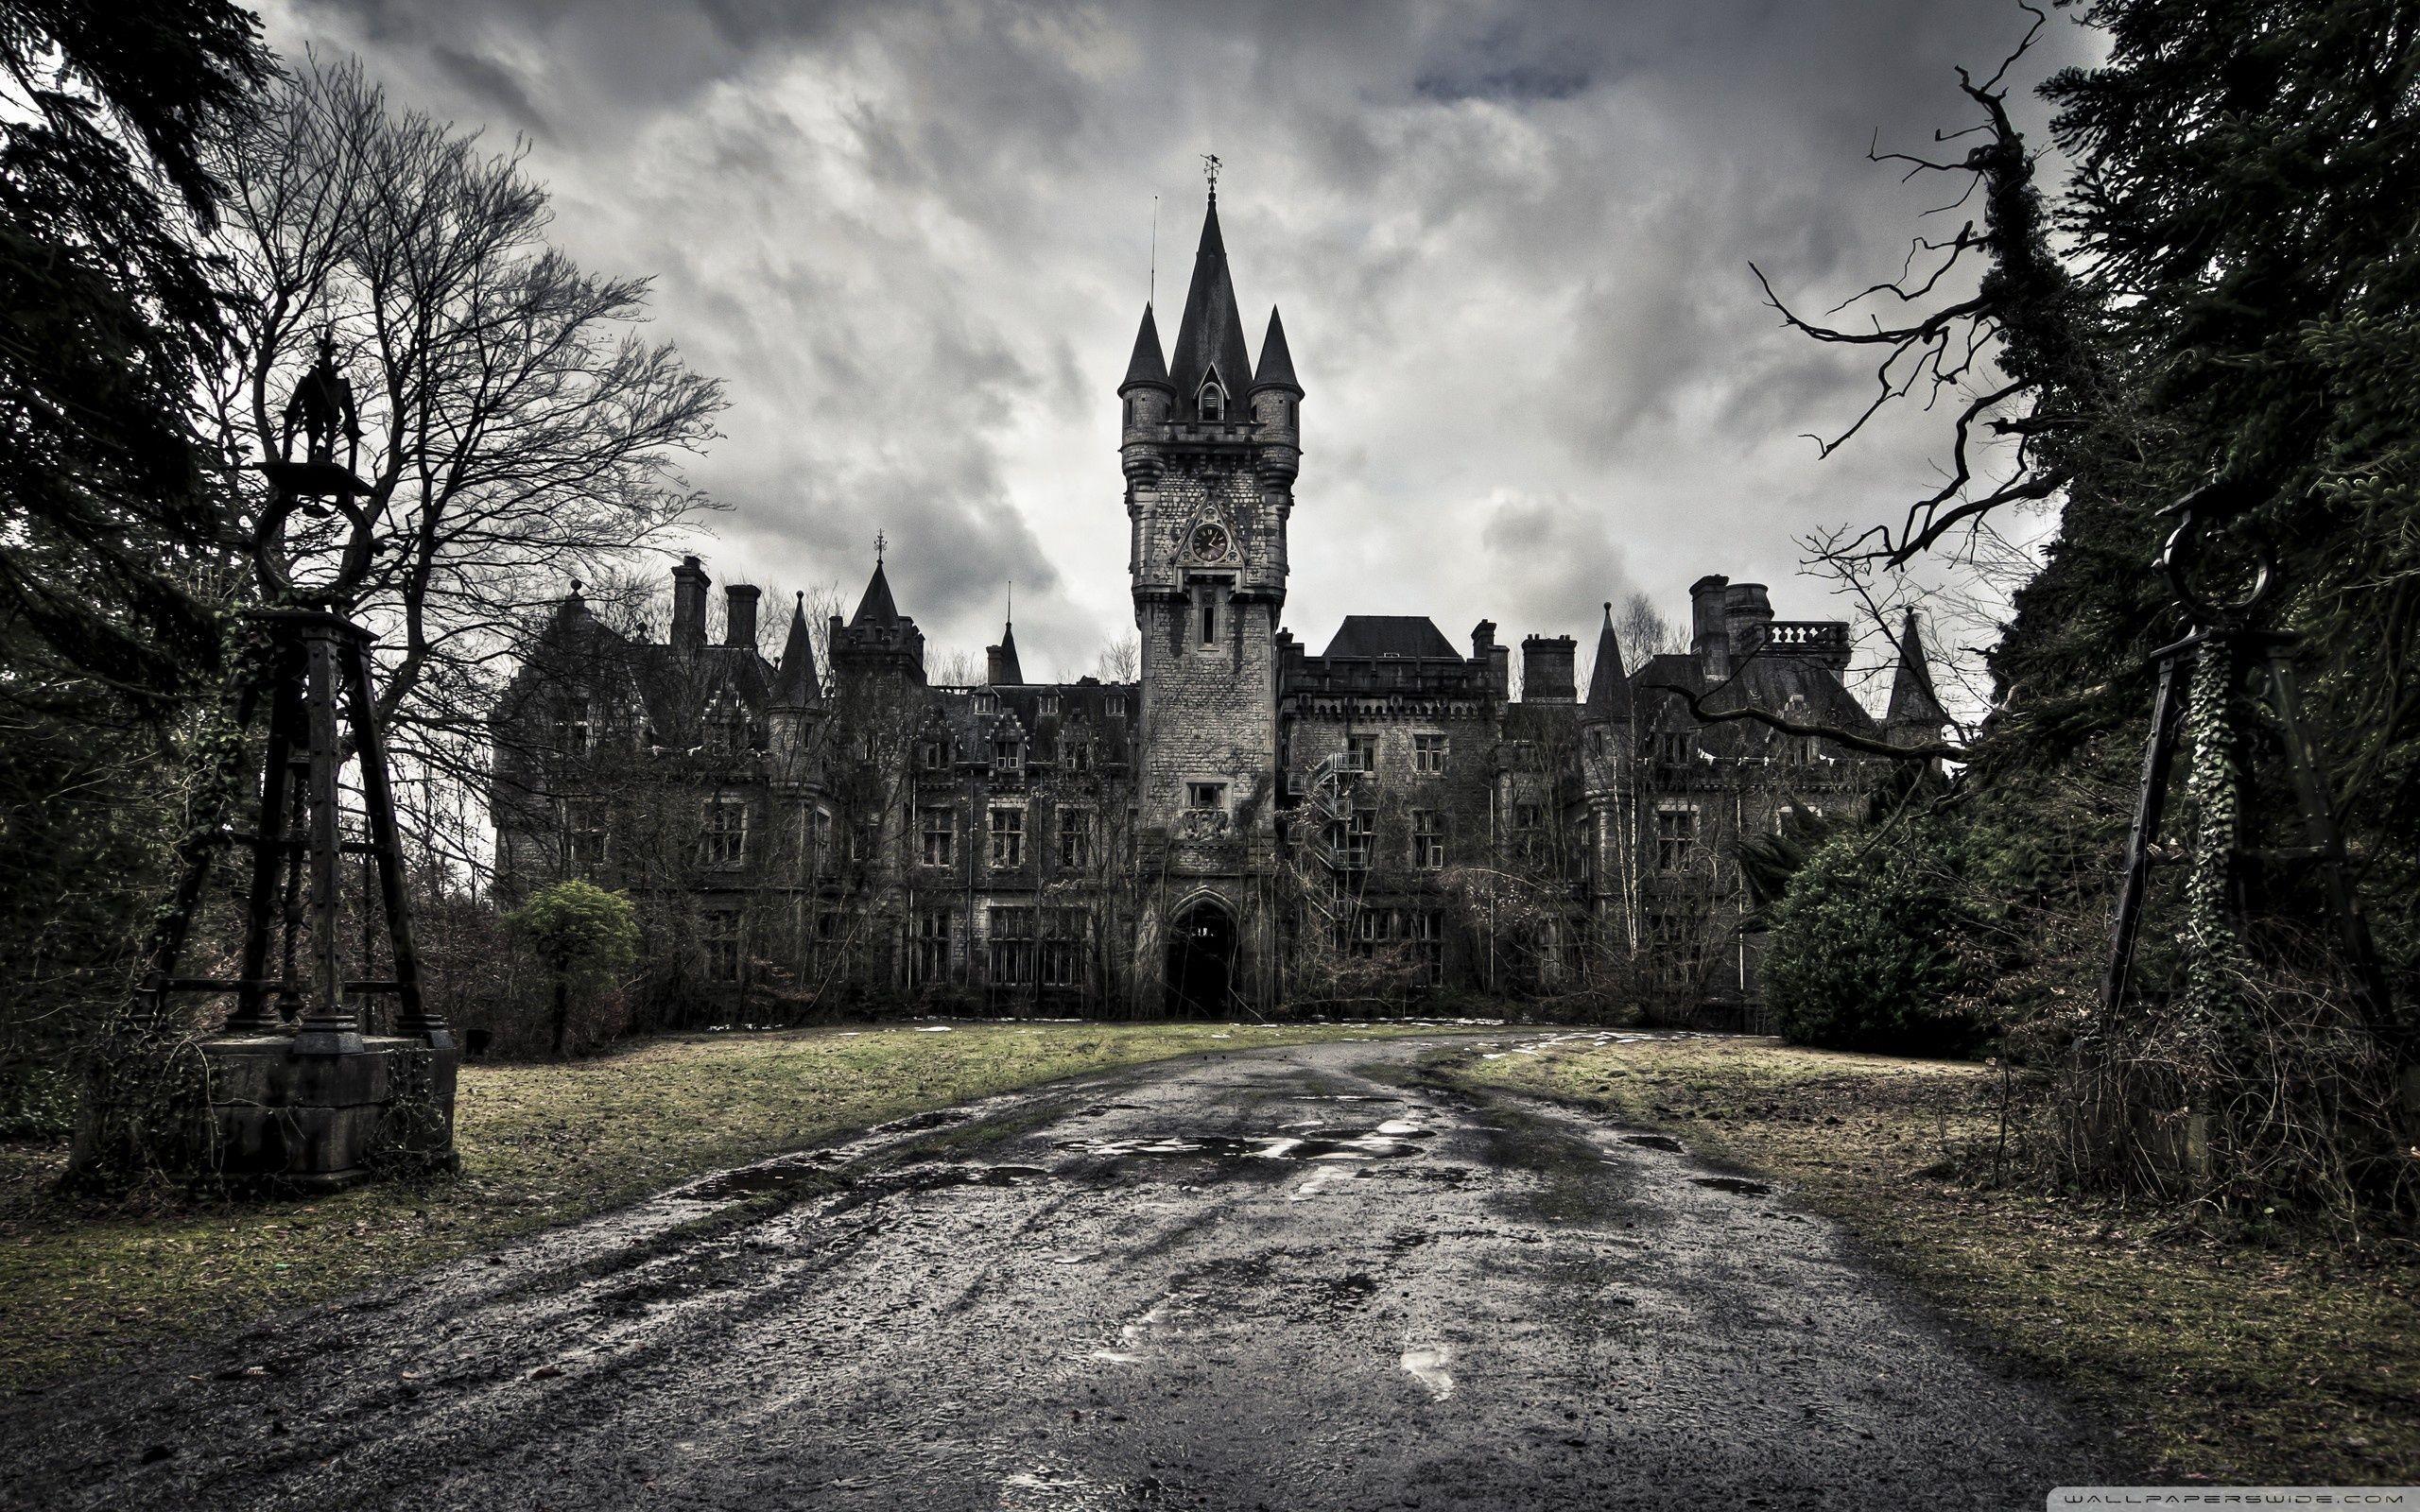 Creepy Castle Wallpapers   Top Creepy Castle Backgrounds 2560x1600